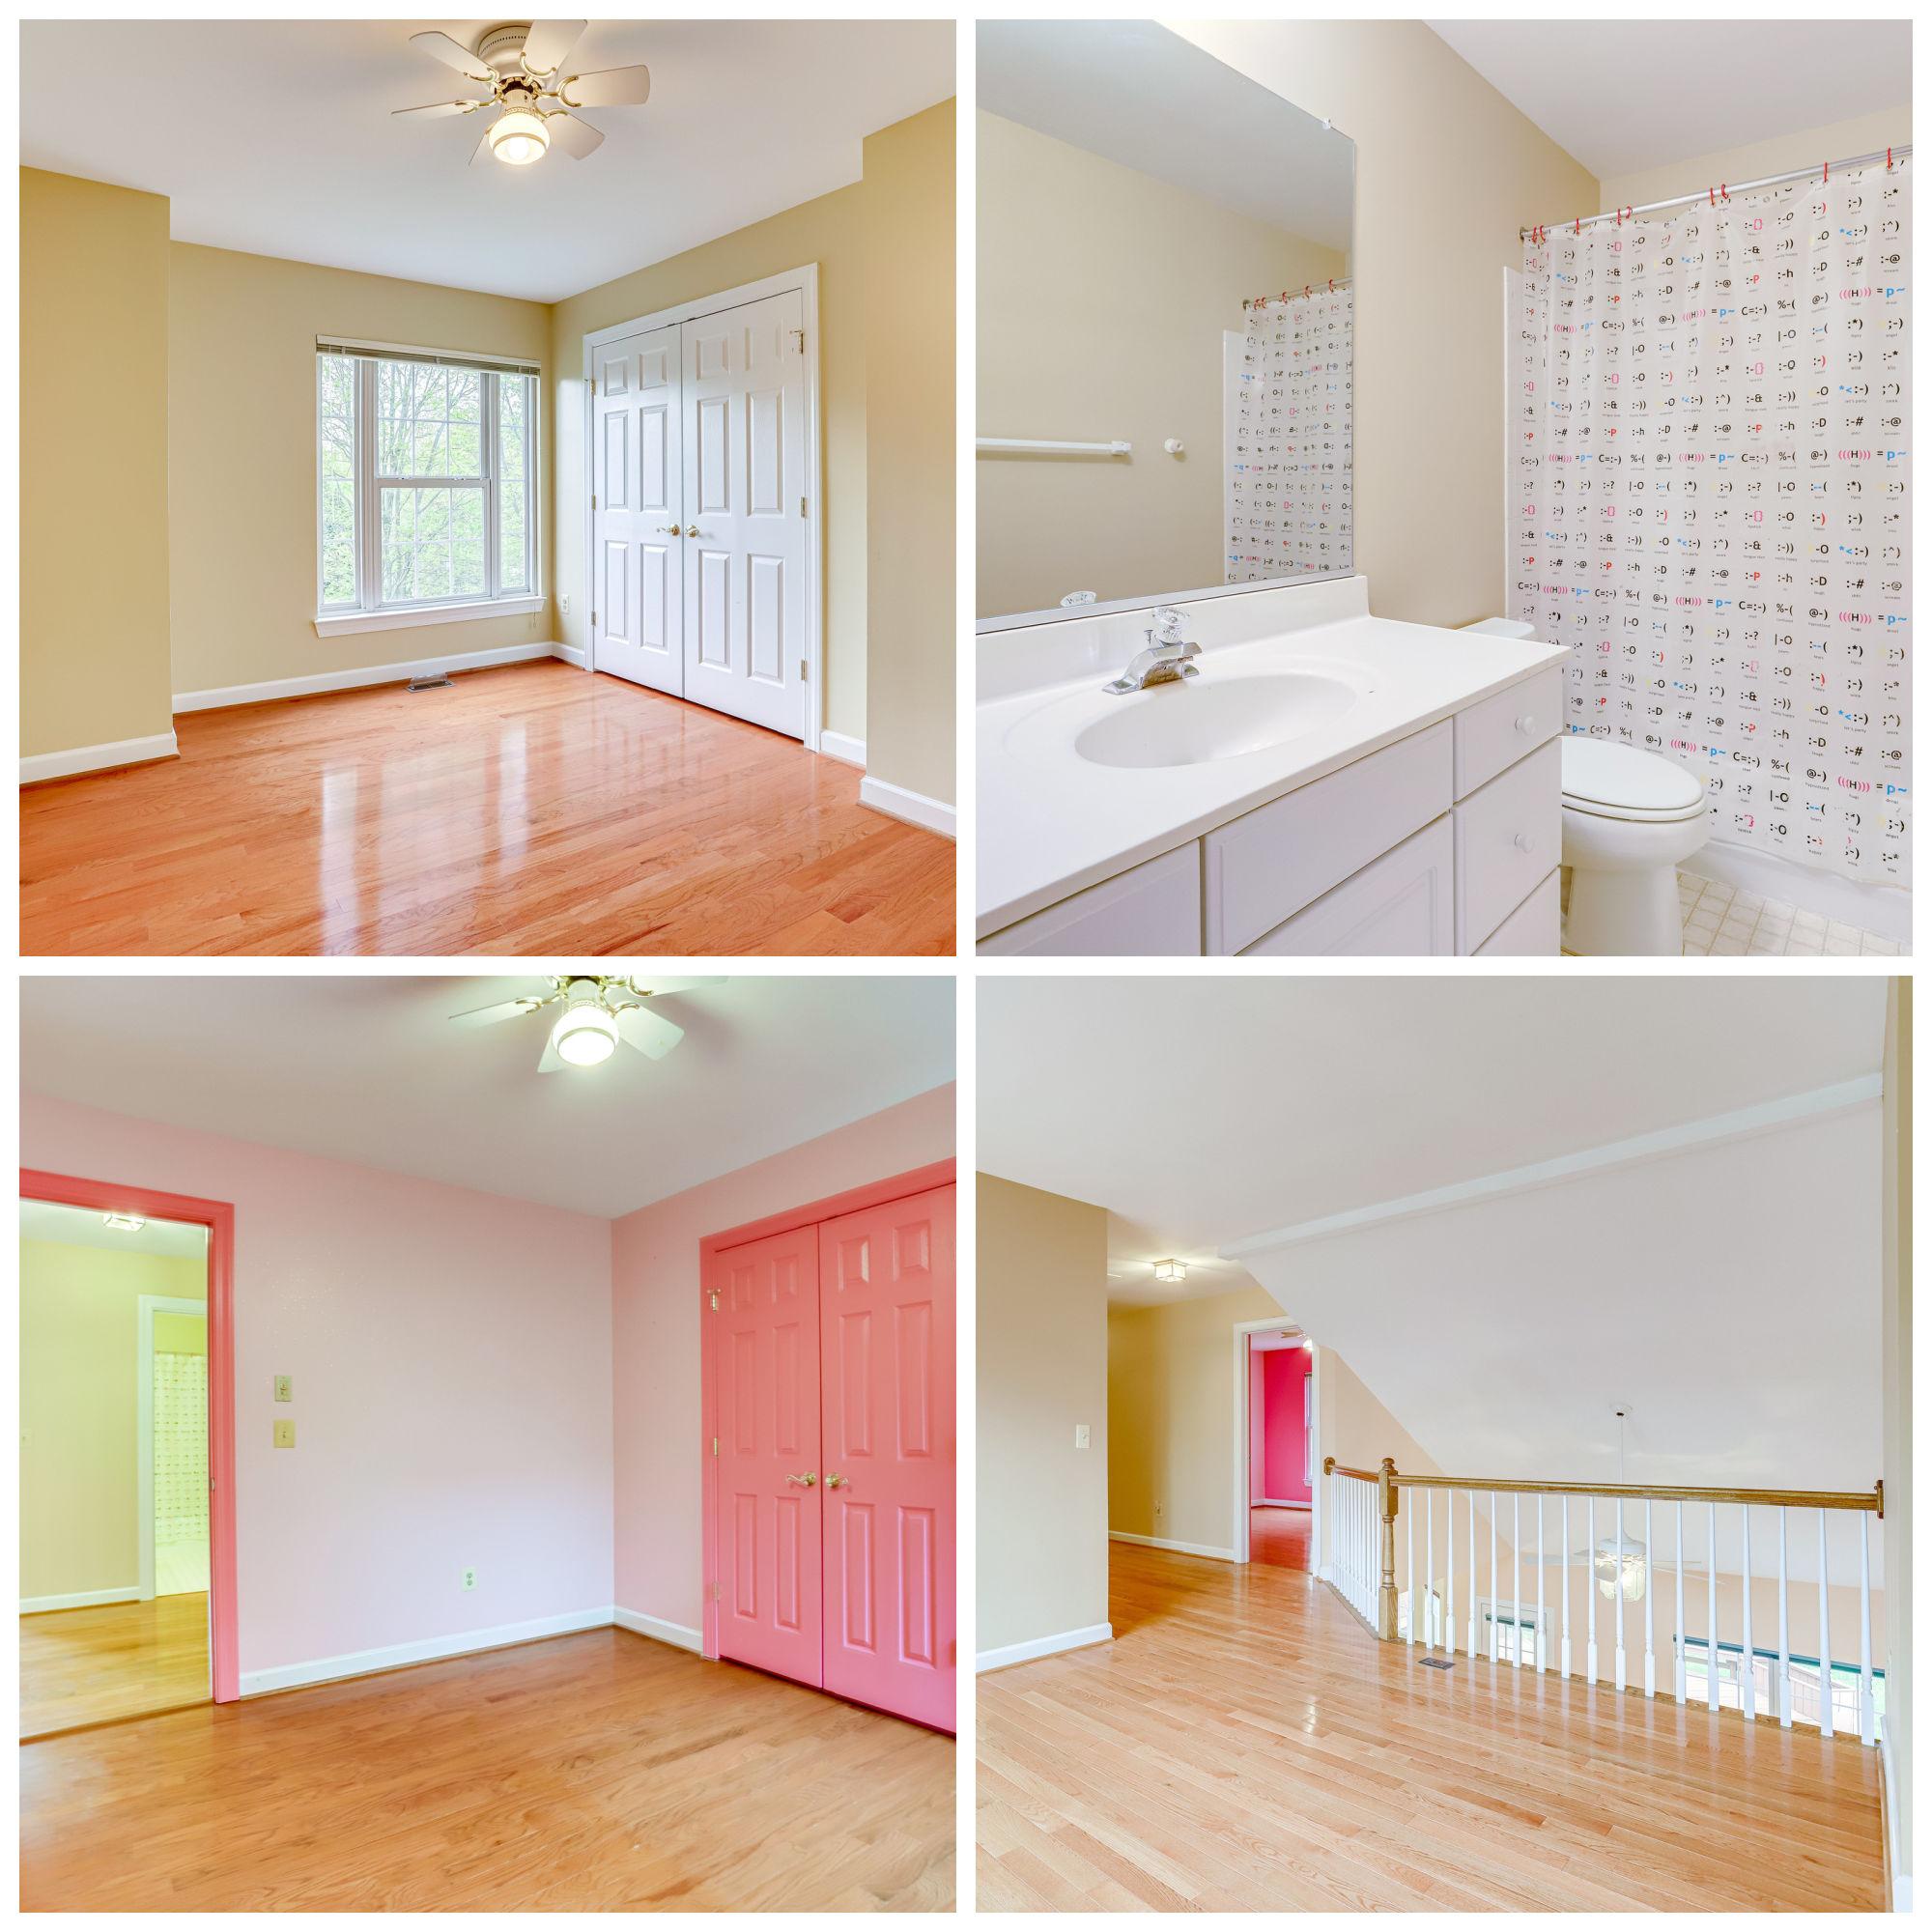 46384 Woodlake Pl, Sterling- Additional Bedrooms, Bathroom, and Loft